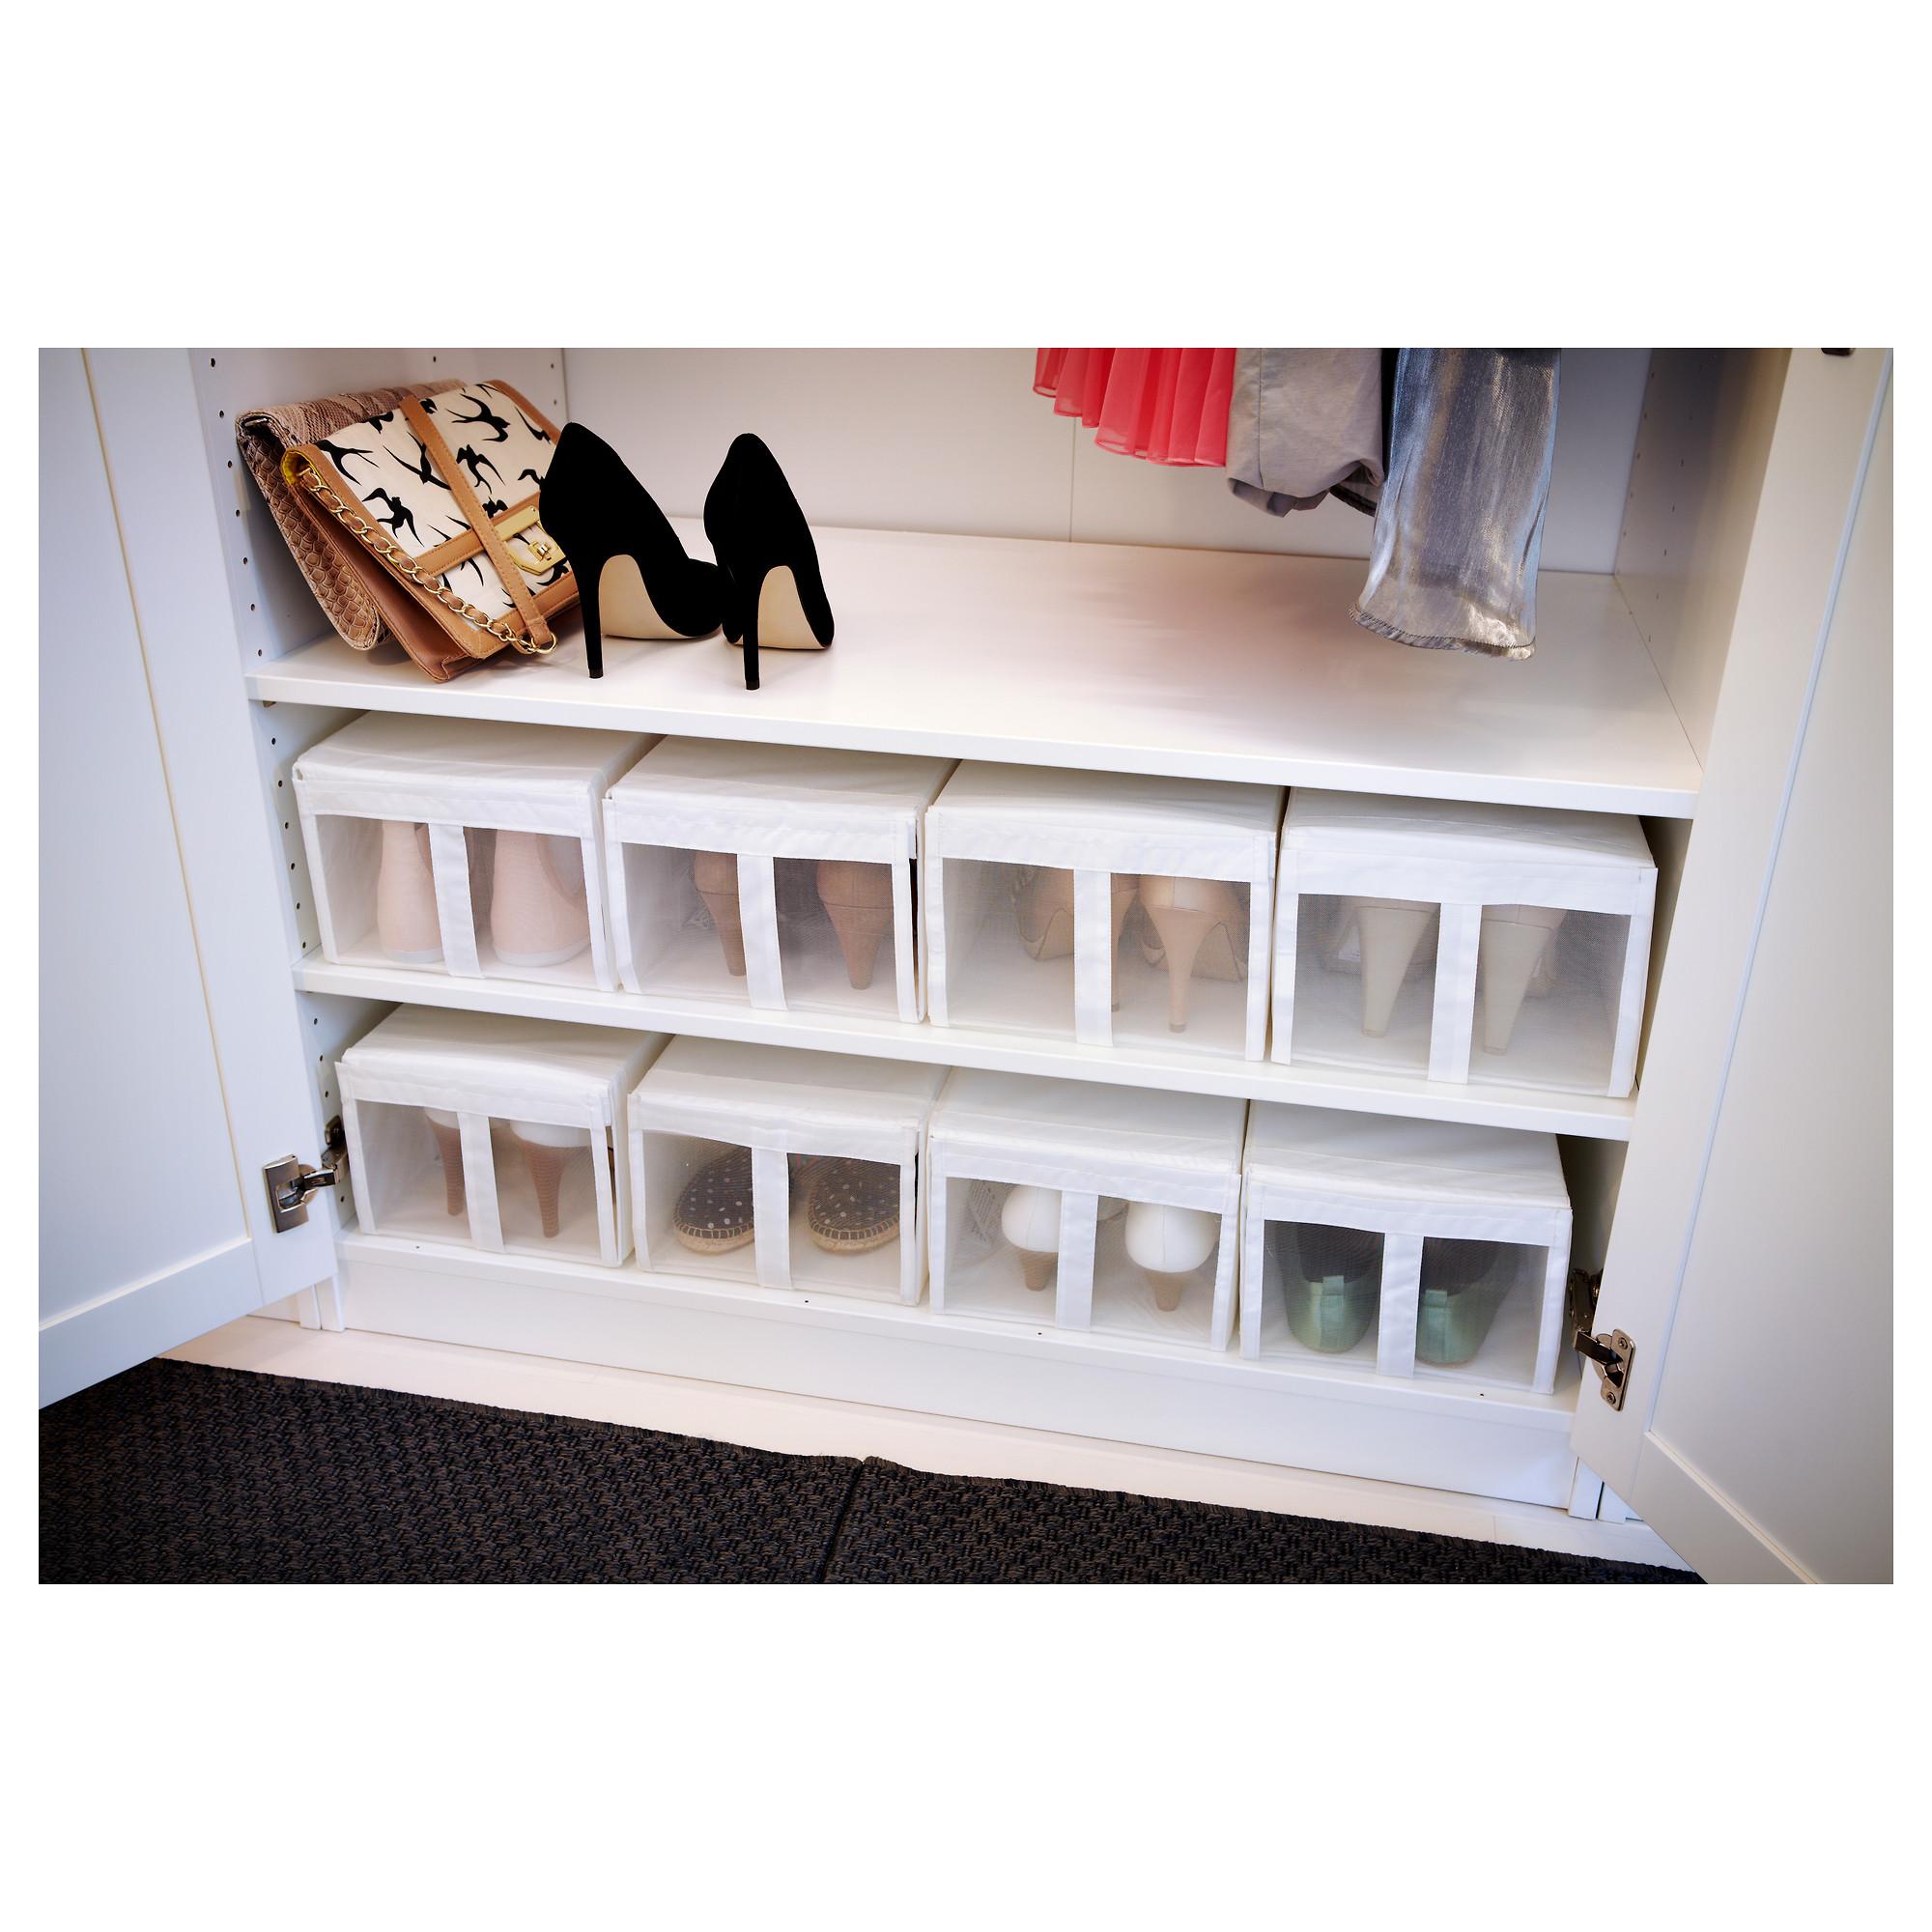 IKEA SKUBB Shoe box white Ikea, Shoe box, Ikea wardrobe